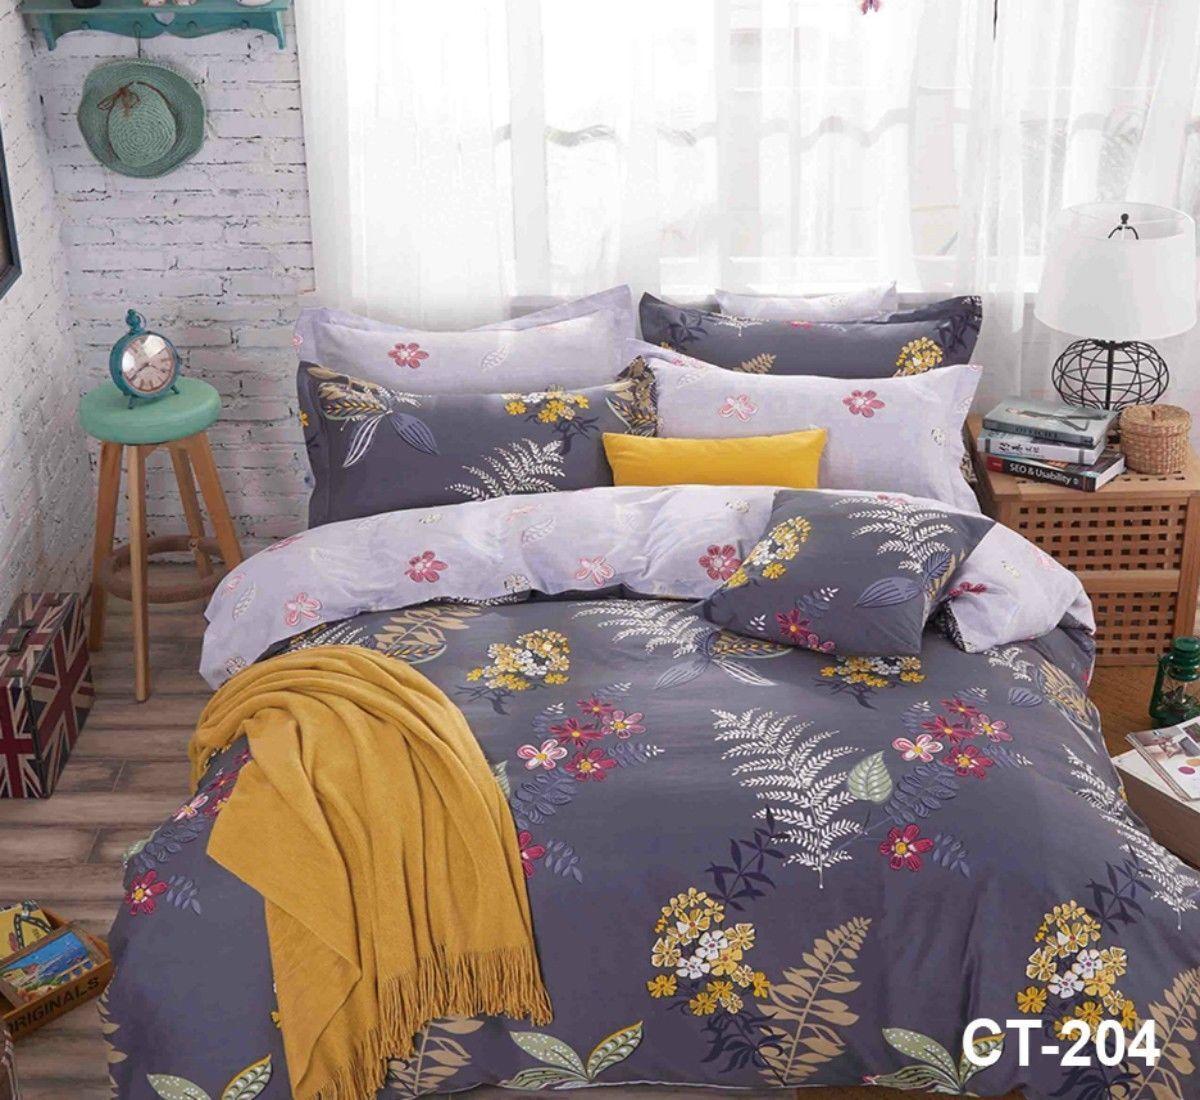 4 Pieces Complete Set 200 Thread Counts 100% Egyptian Cotton Bedding Set CT-204